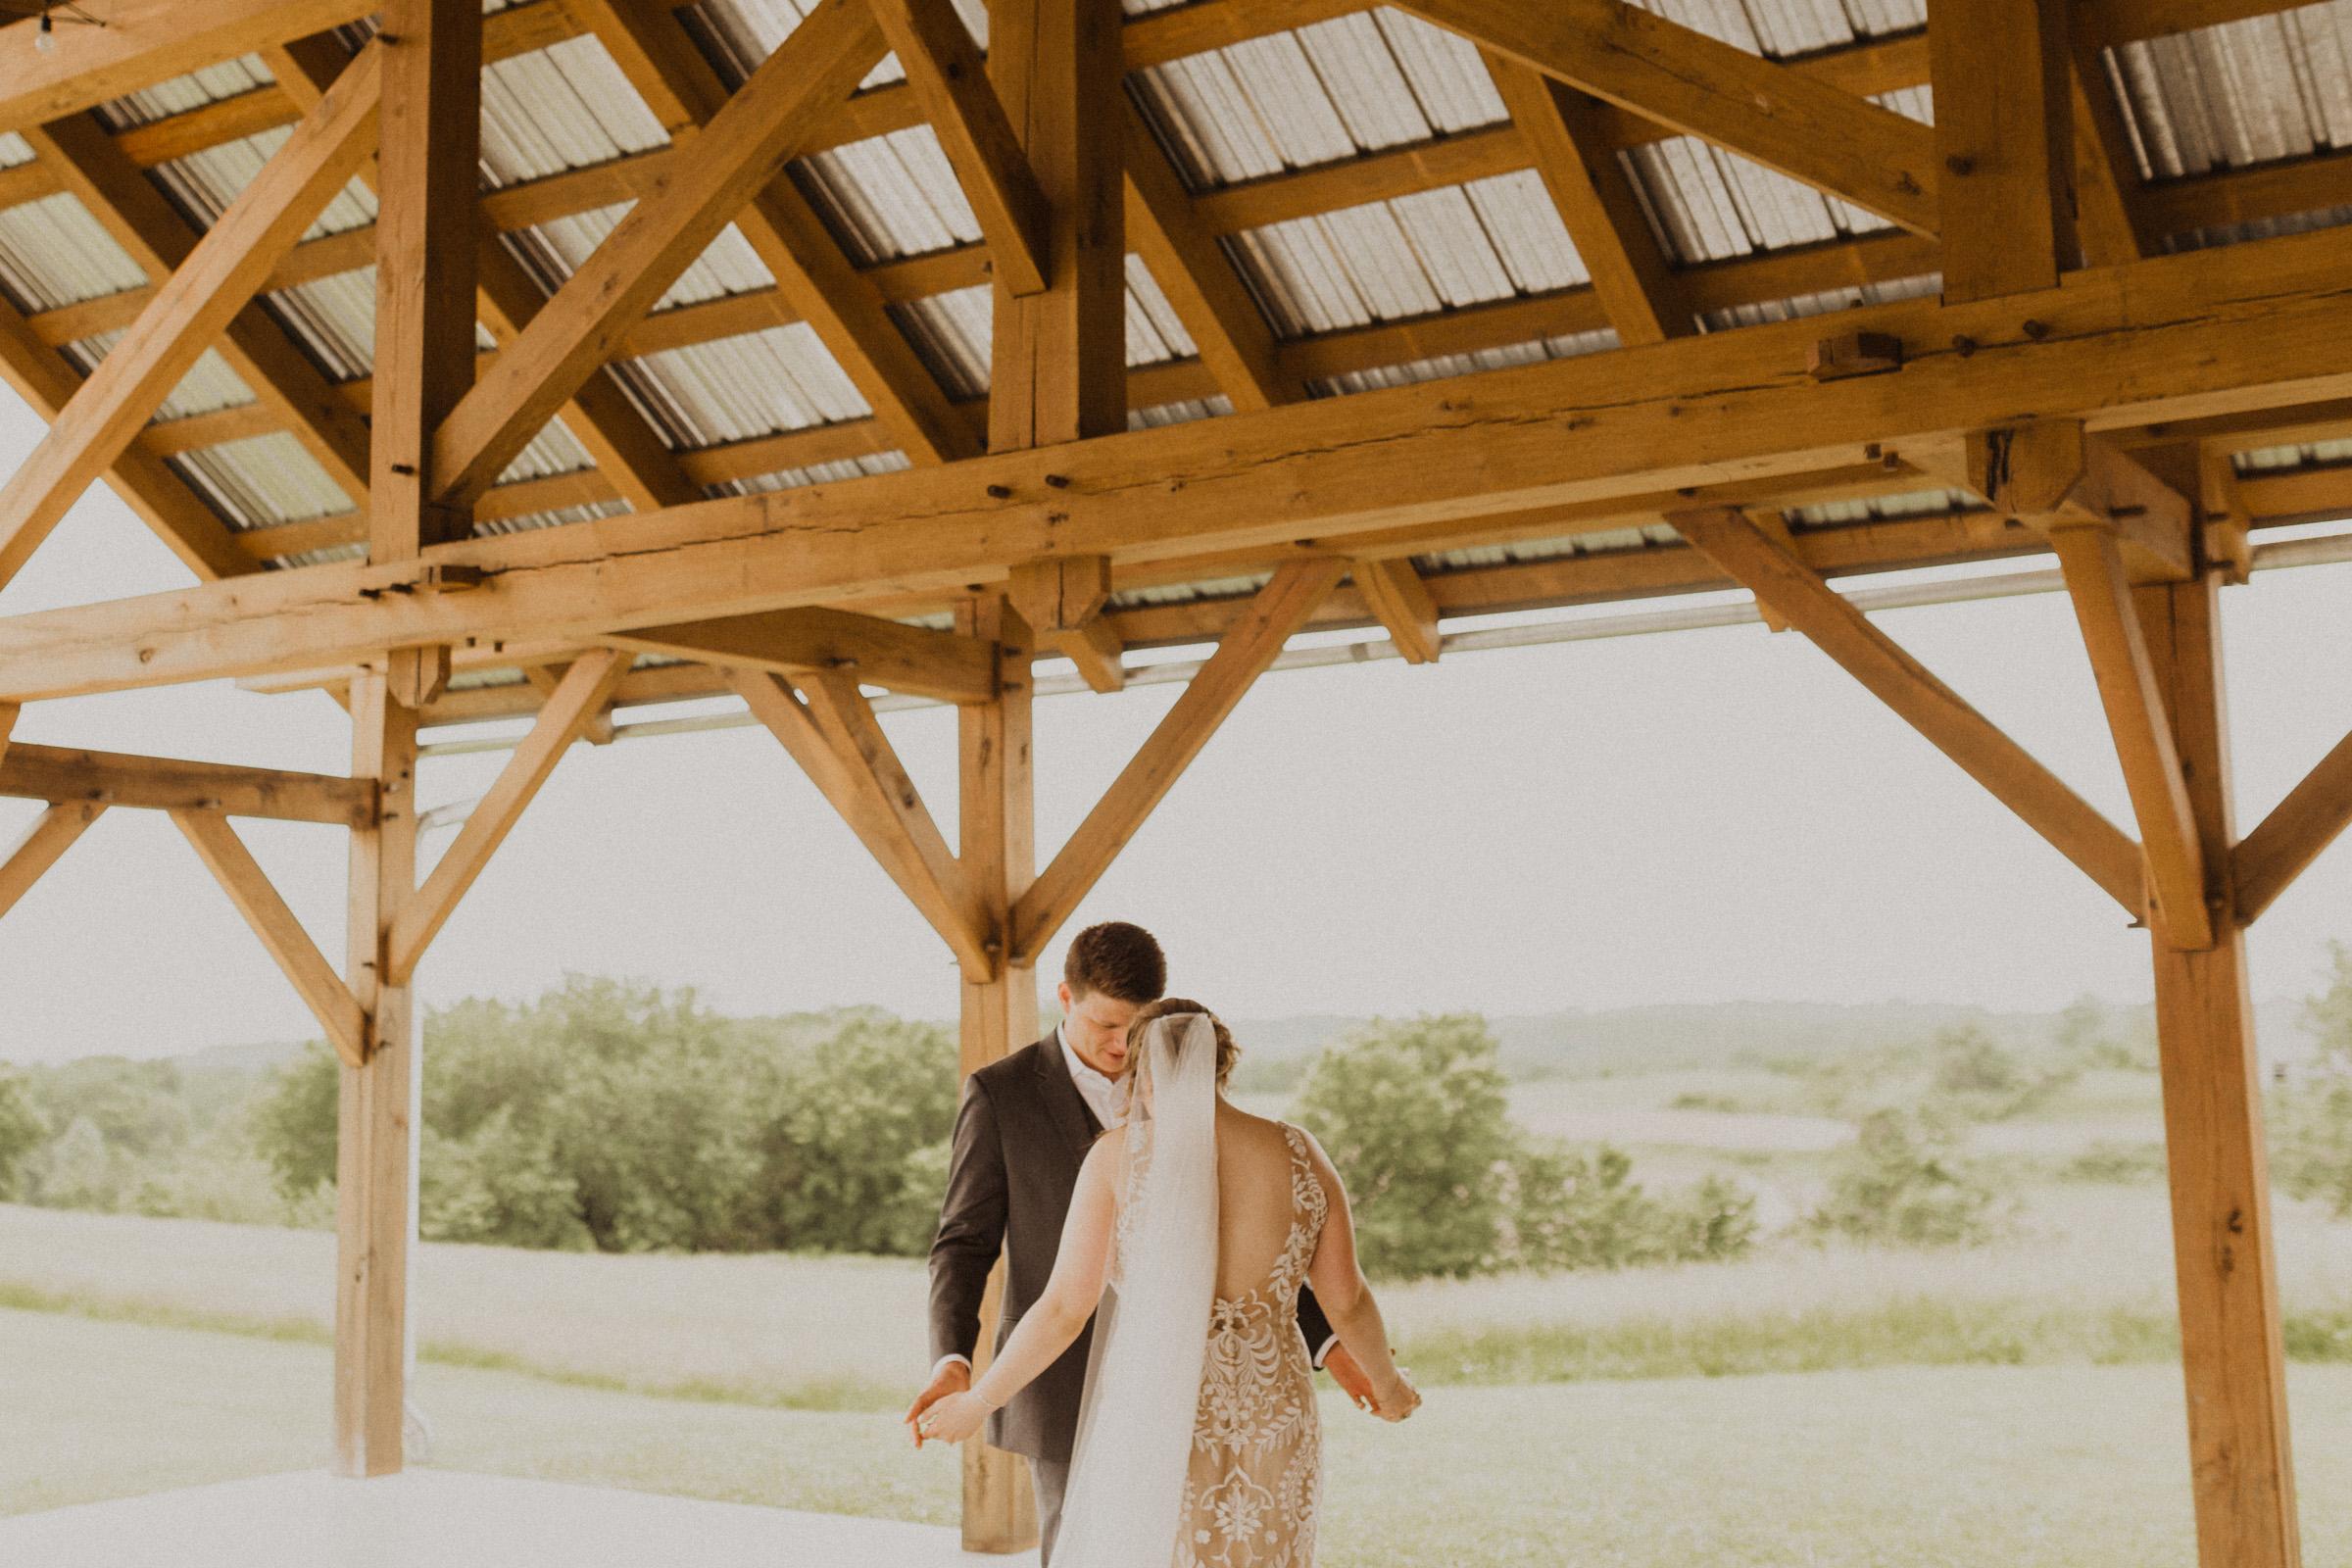 alyssa barletter photography weston red barn farm timberbarn summer outdoor wedding-13.jpg